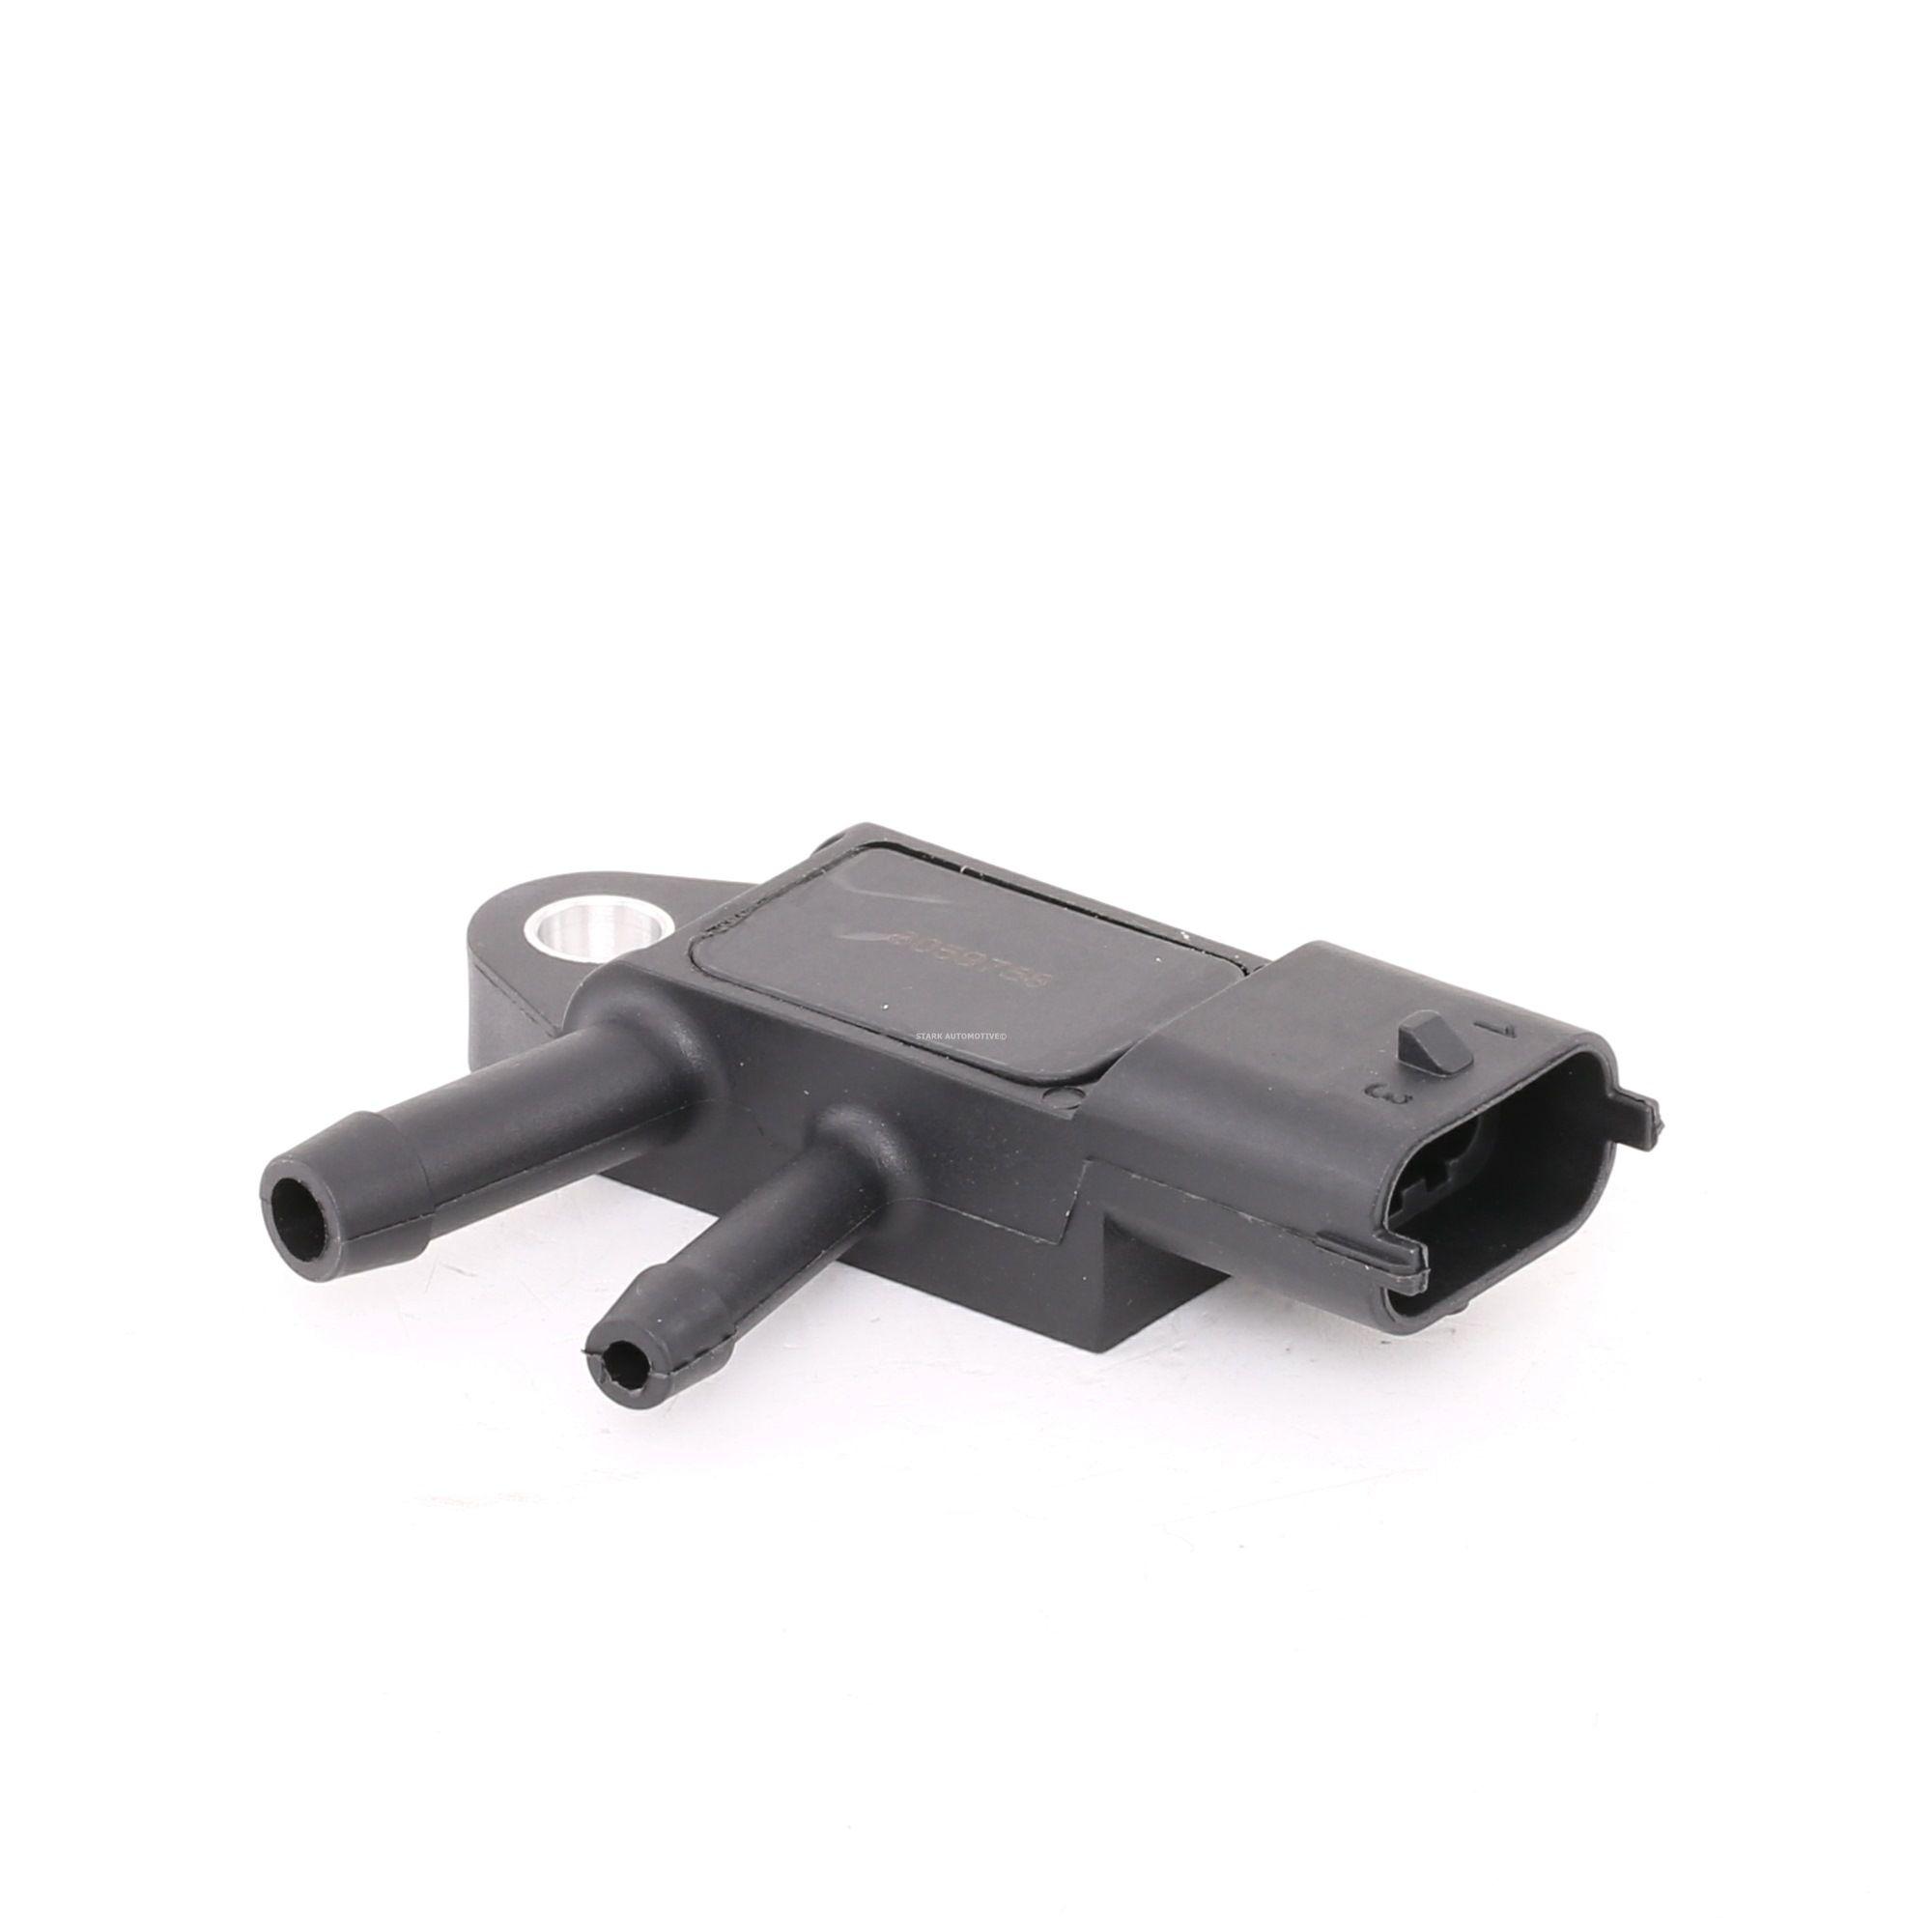 RENAULT GRAND SCÉNIC 2016 Differenzdrucksensor - Original STARK SKSEP-1500004 Pol-Anzahl: 3-polig